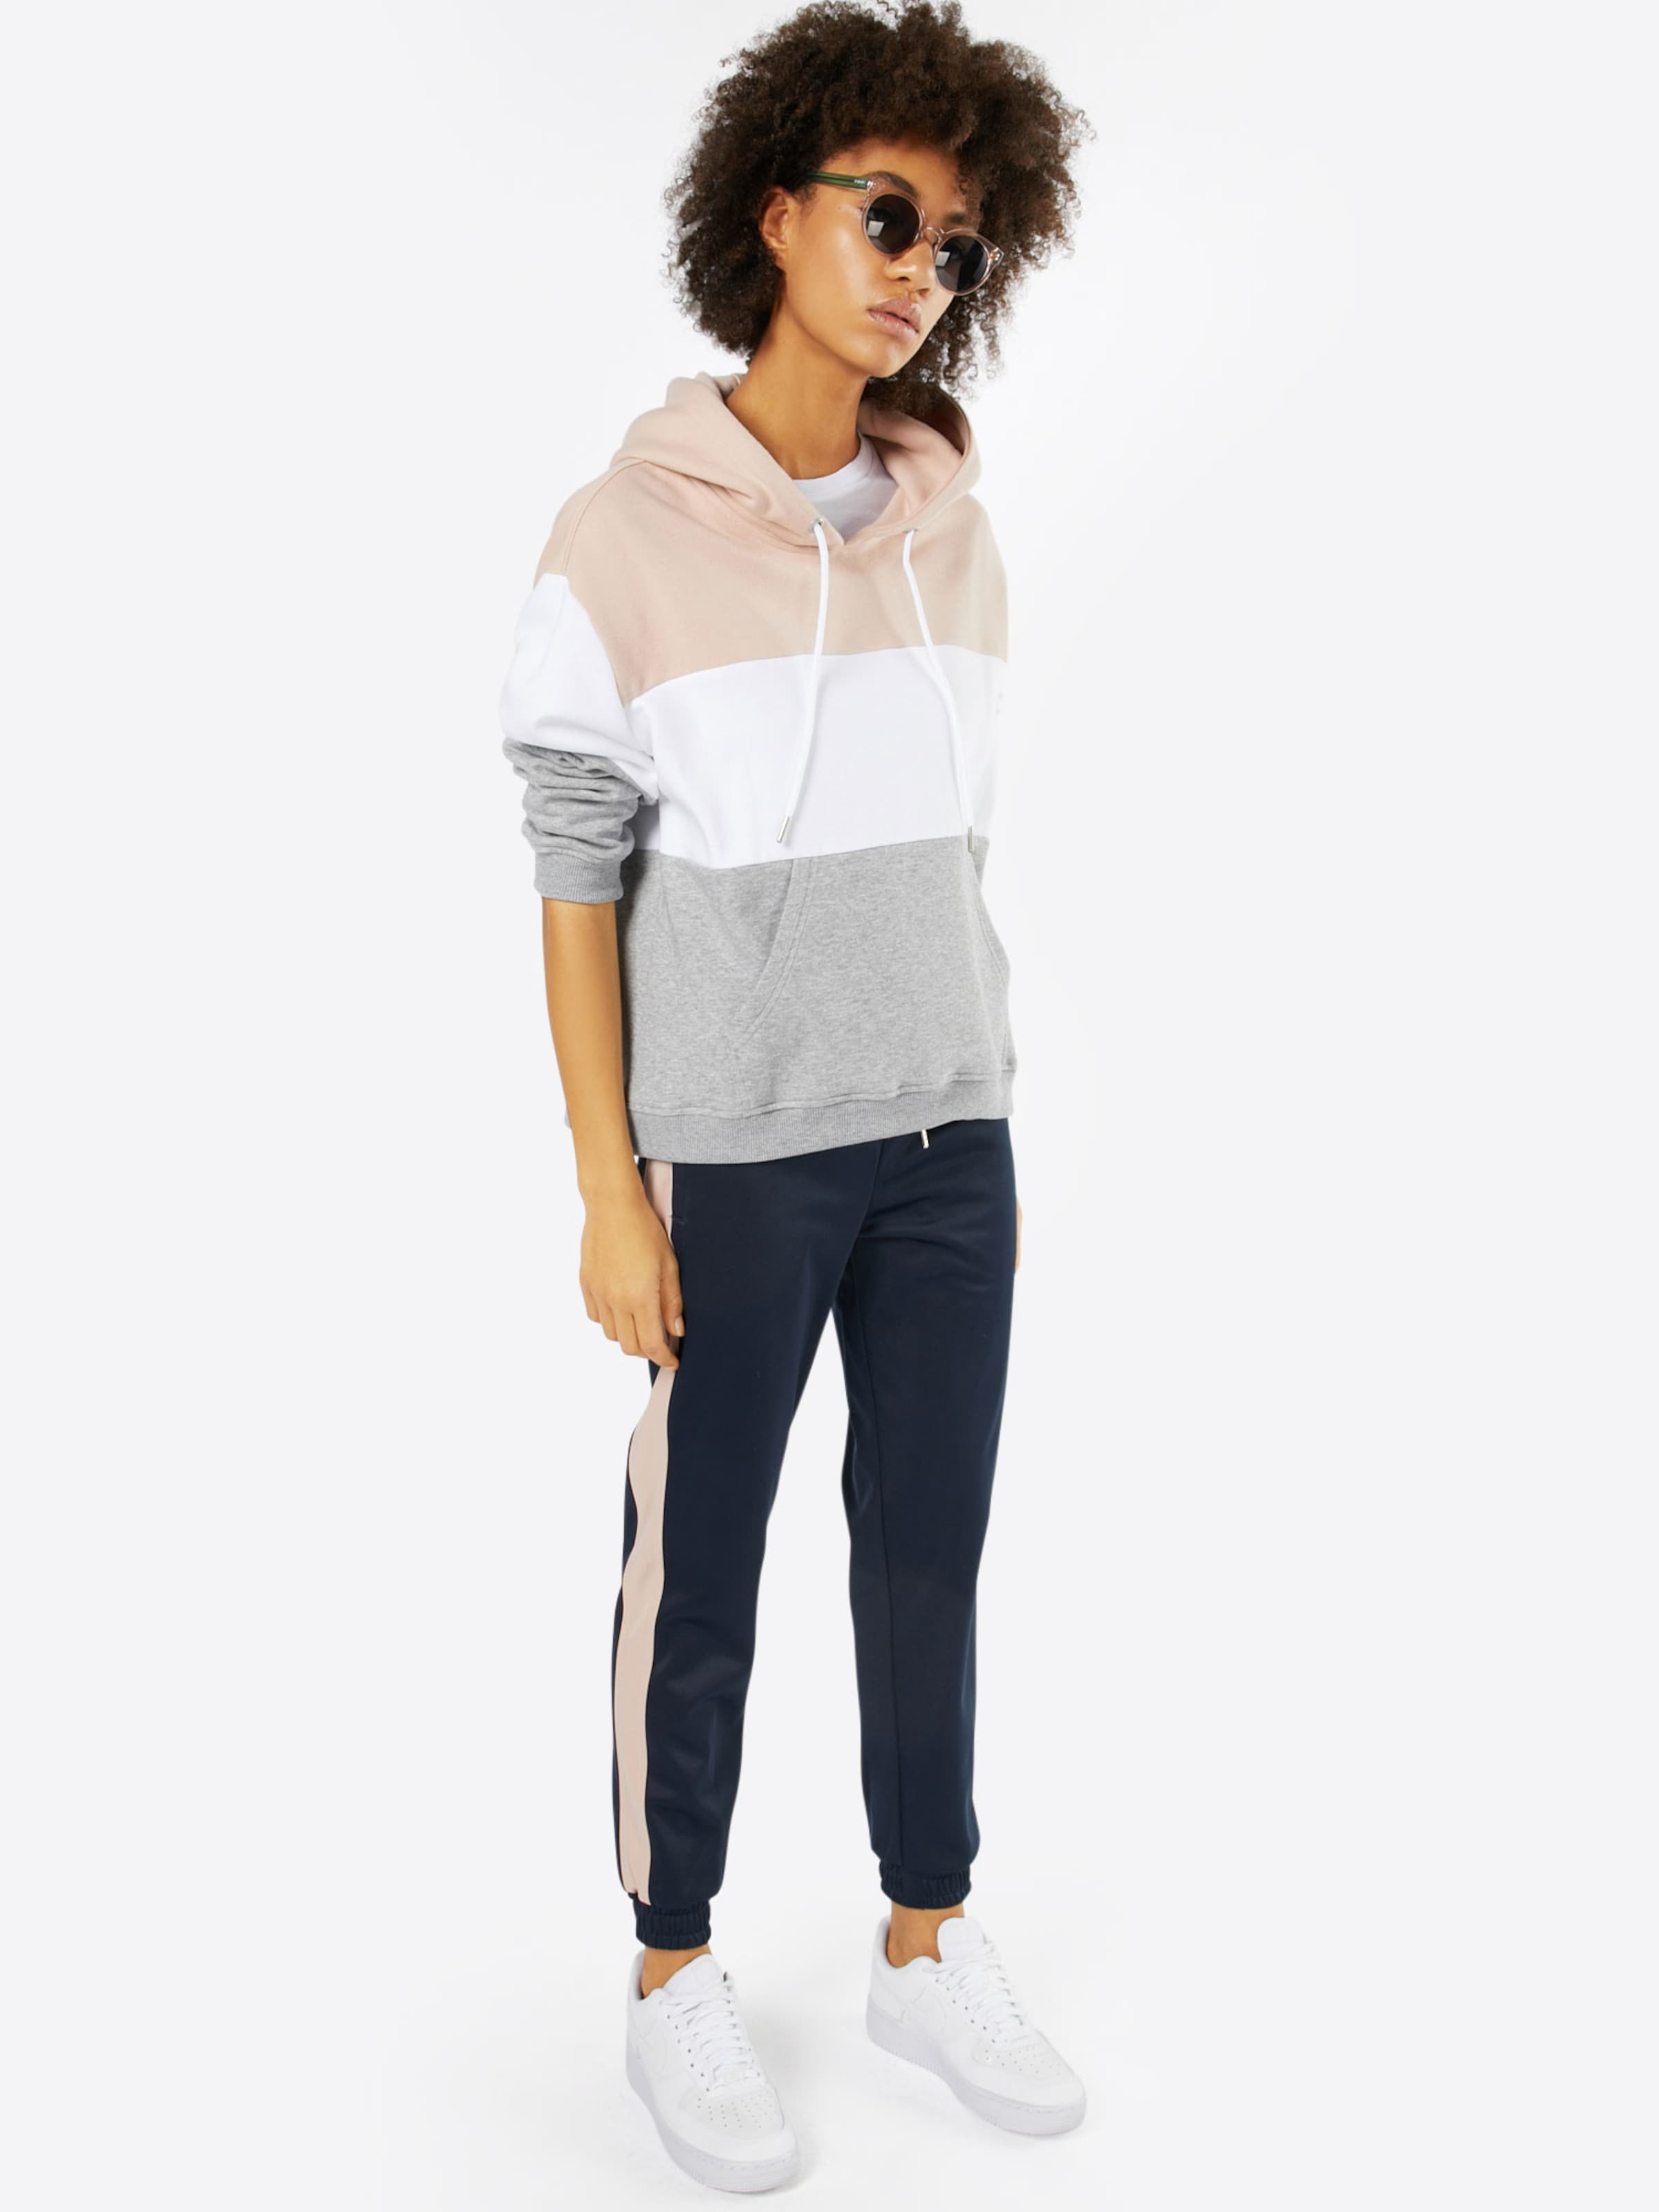 Wirklich Billige Schuhe Online Urban Classics Sweatshirt '3-Tone Hoody' Auslass Sneakernews Y3hW6c